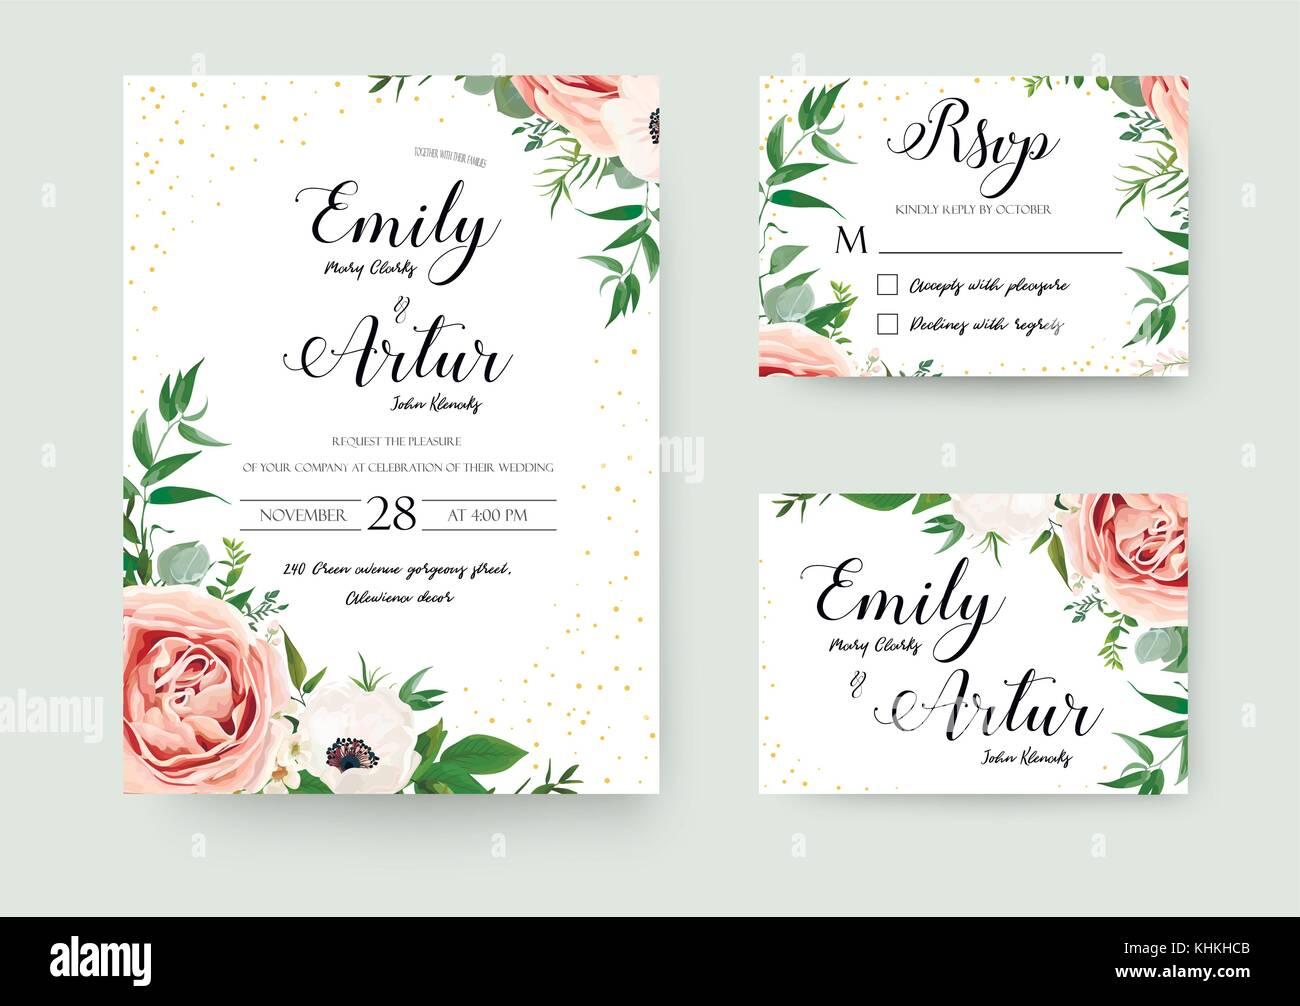 Vector Wedding Invitations: Wedding Vector Floral Invite Invitation Thank You, Rsvp